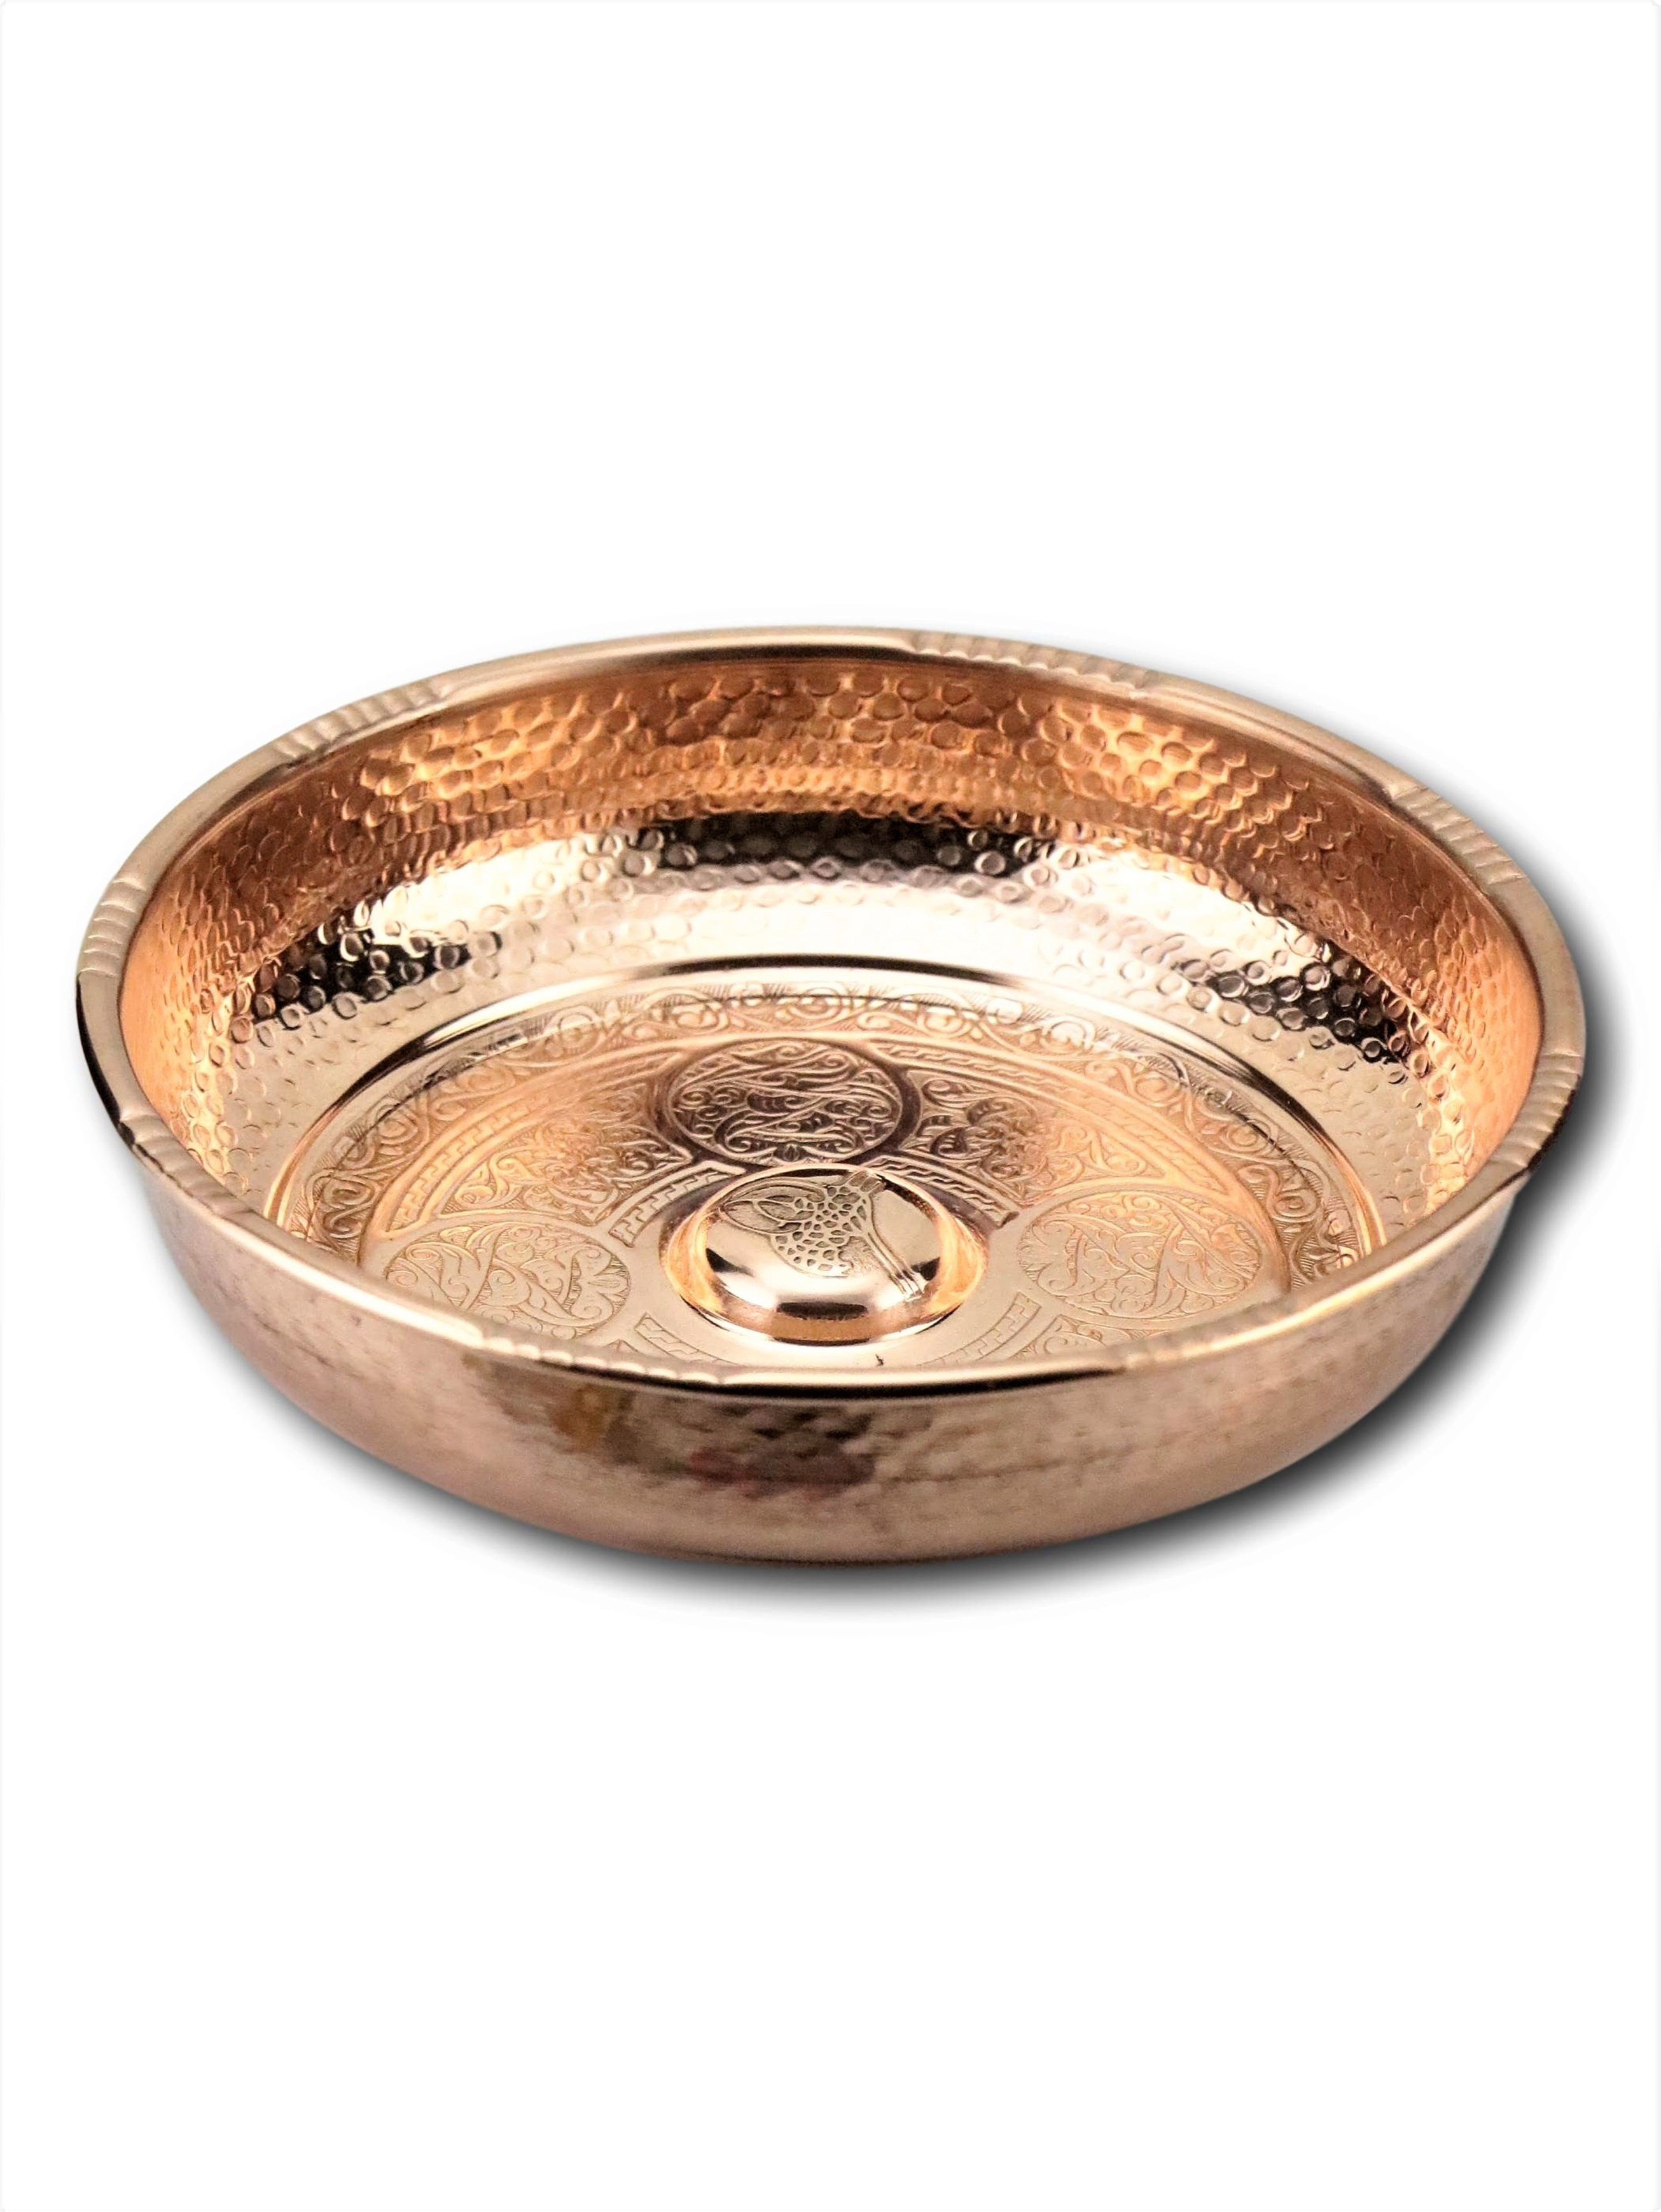 Morya Copper Turkish 2baths Bowl Luxory Bathroom Accessories Elegant Decorative Hammared Handmade Decor Vintage 16 cm enlarge